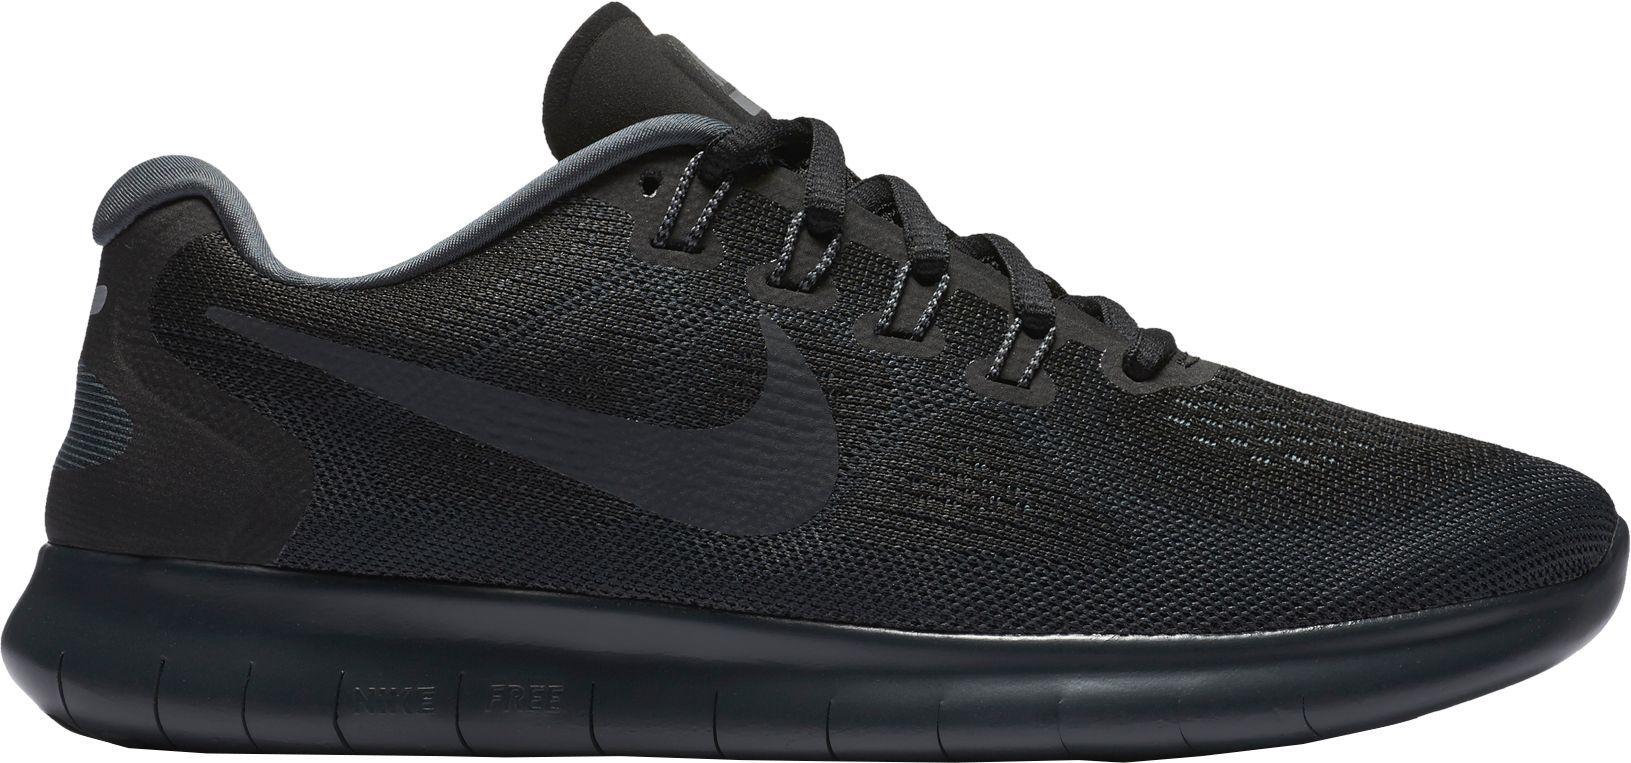 a59a8210f93e Nike Women s Free RN 2017 Running Shoes